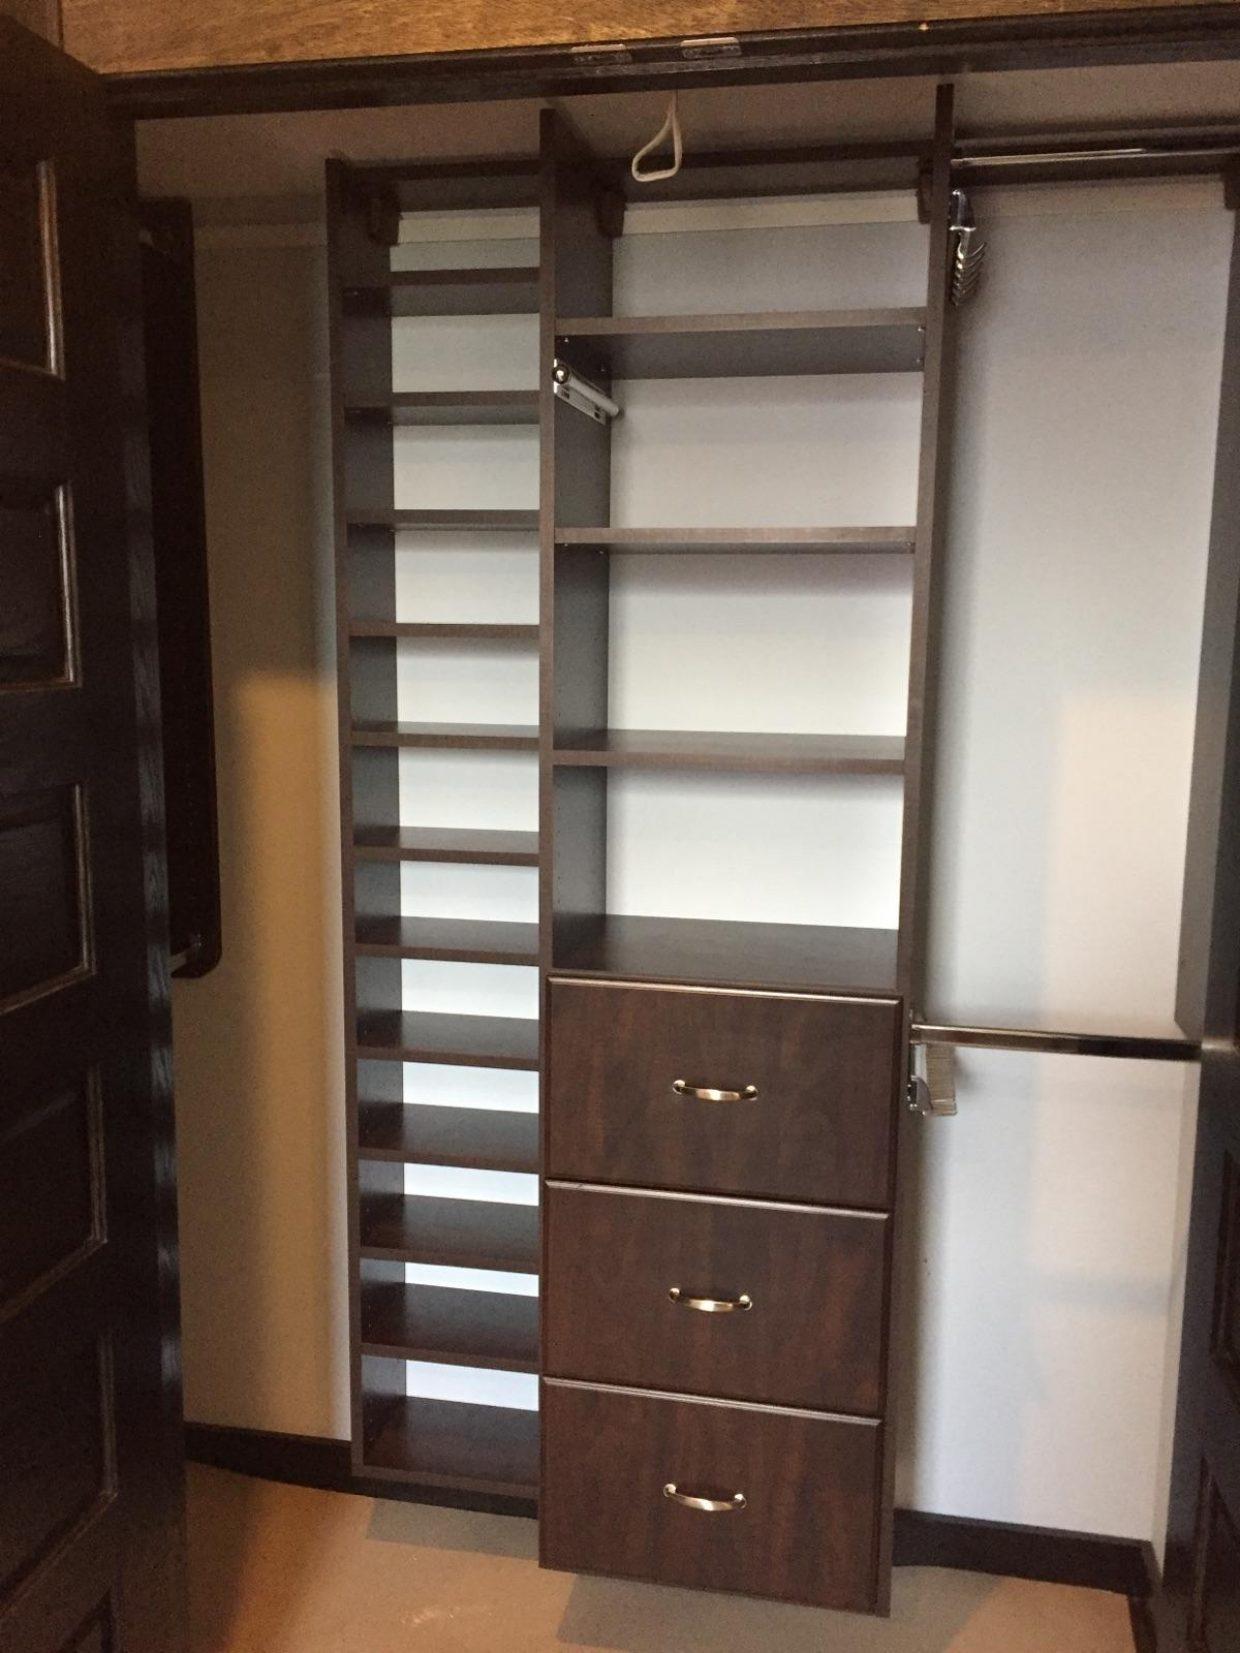 Chocolate Wall Mount Reach-In Closet